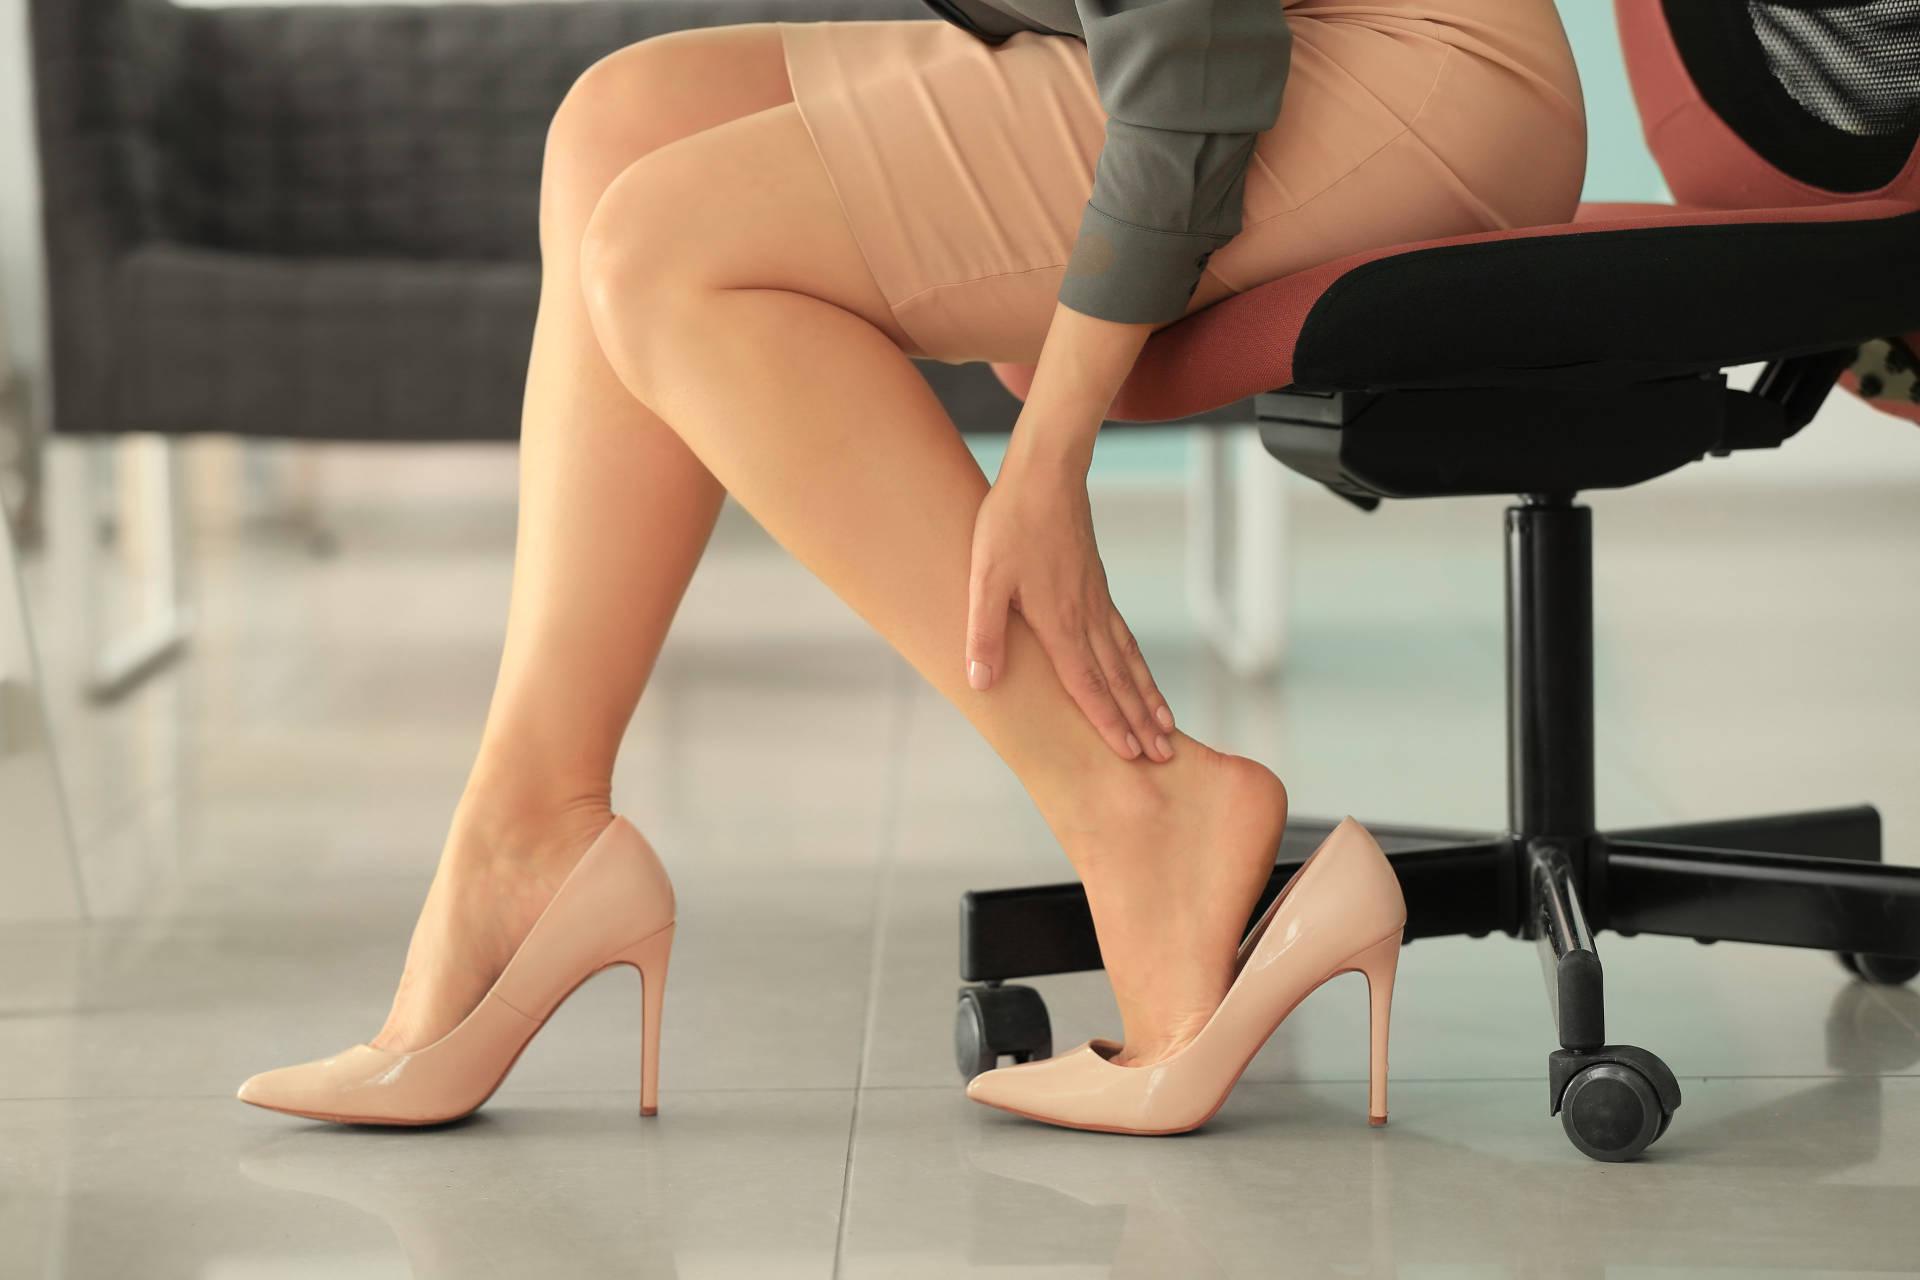 Pesadez de piernas